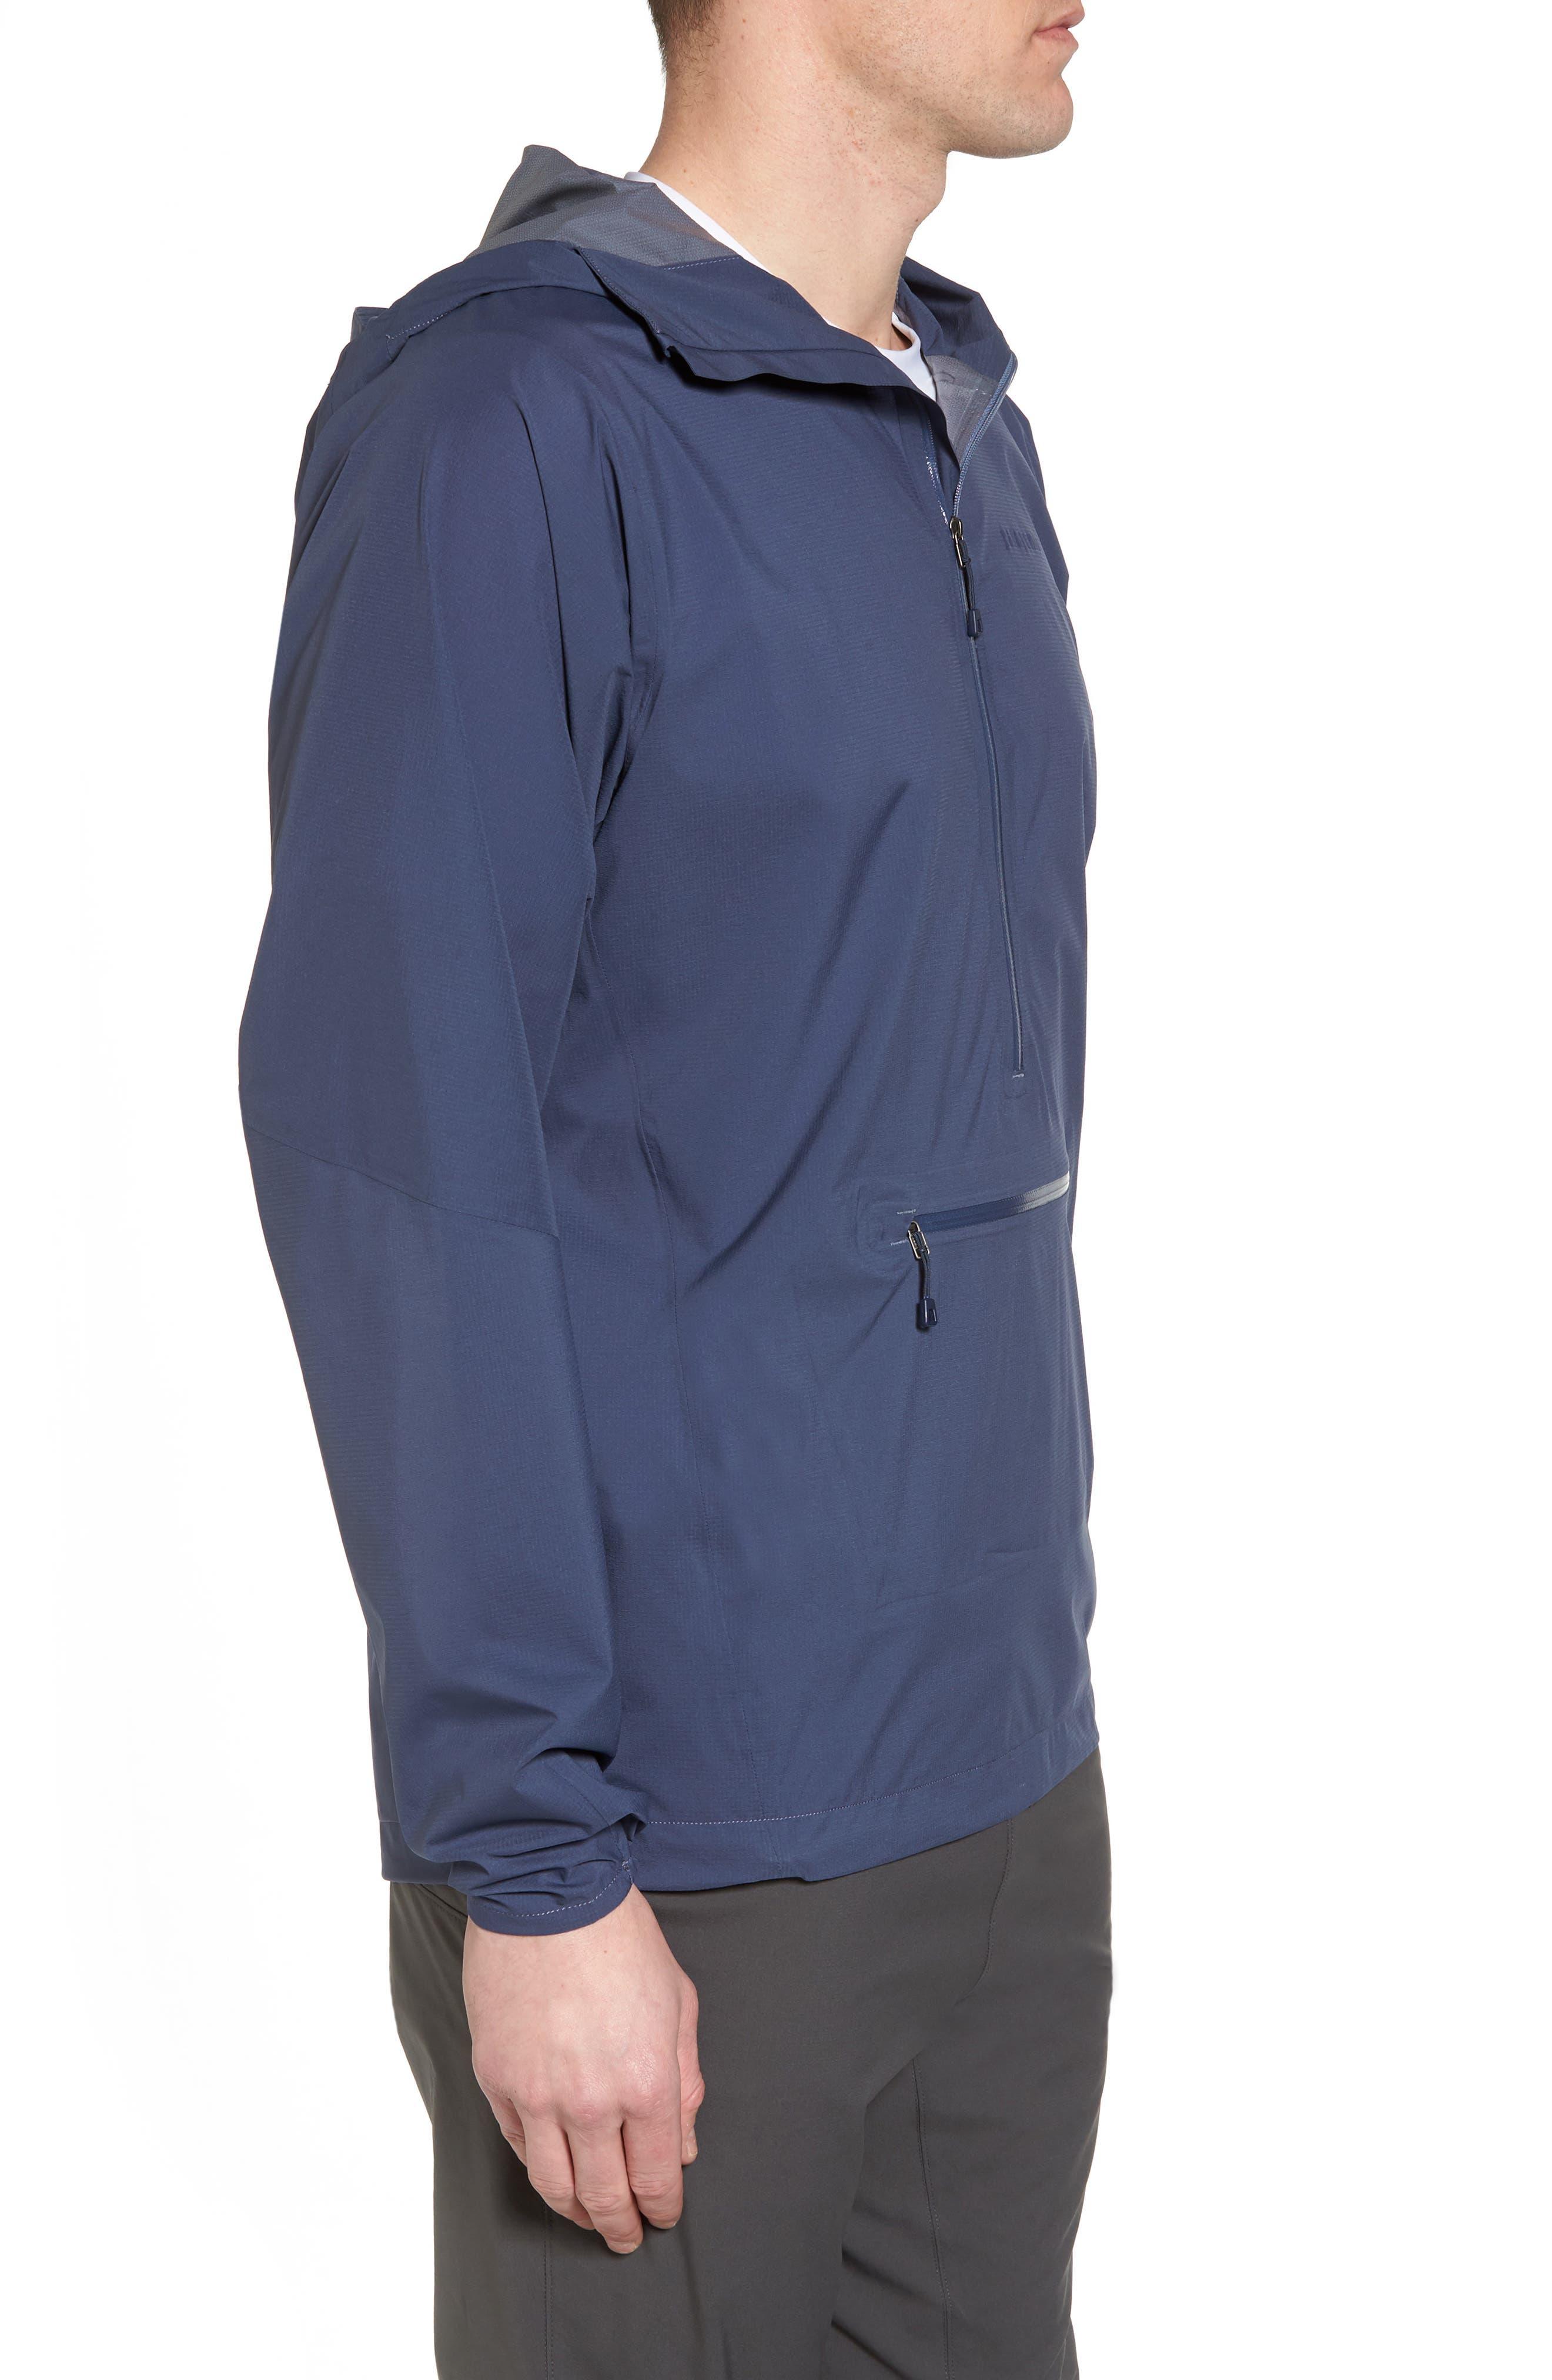 Stretch Rainshadow Jacket,                             Alternate thumbnail 3, color,                             Dolomite Blue